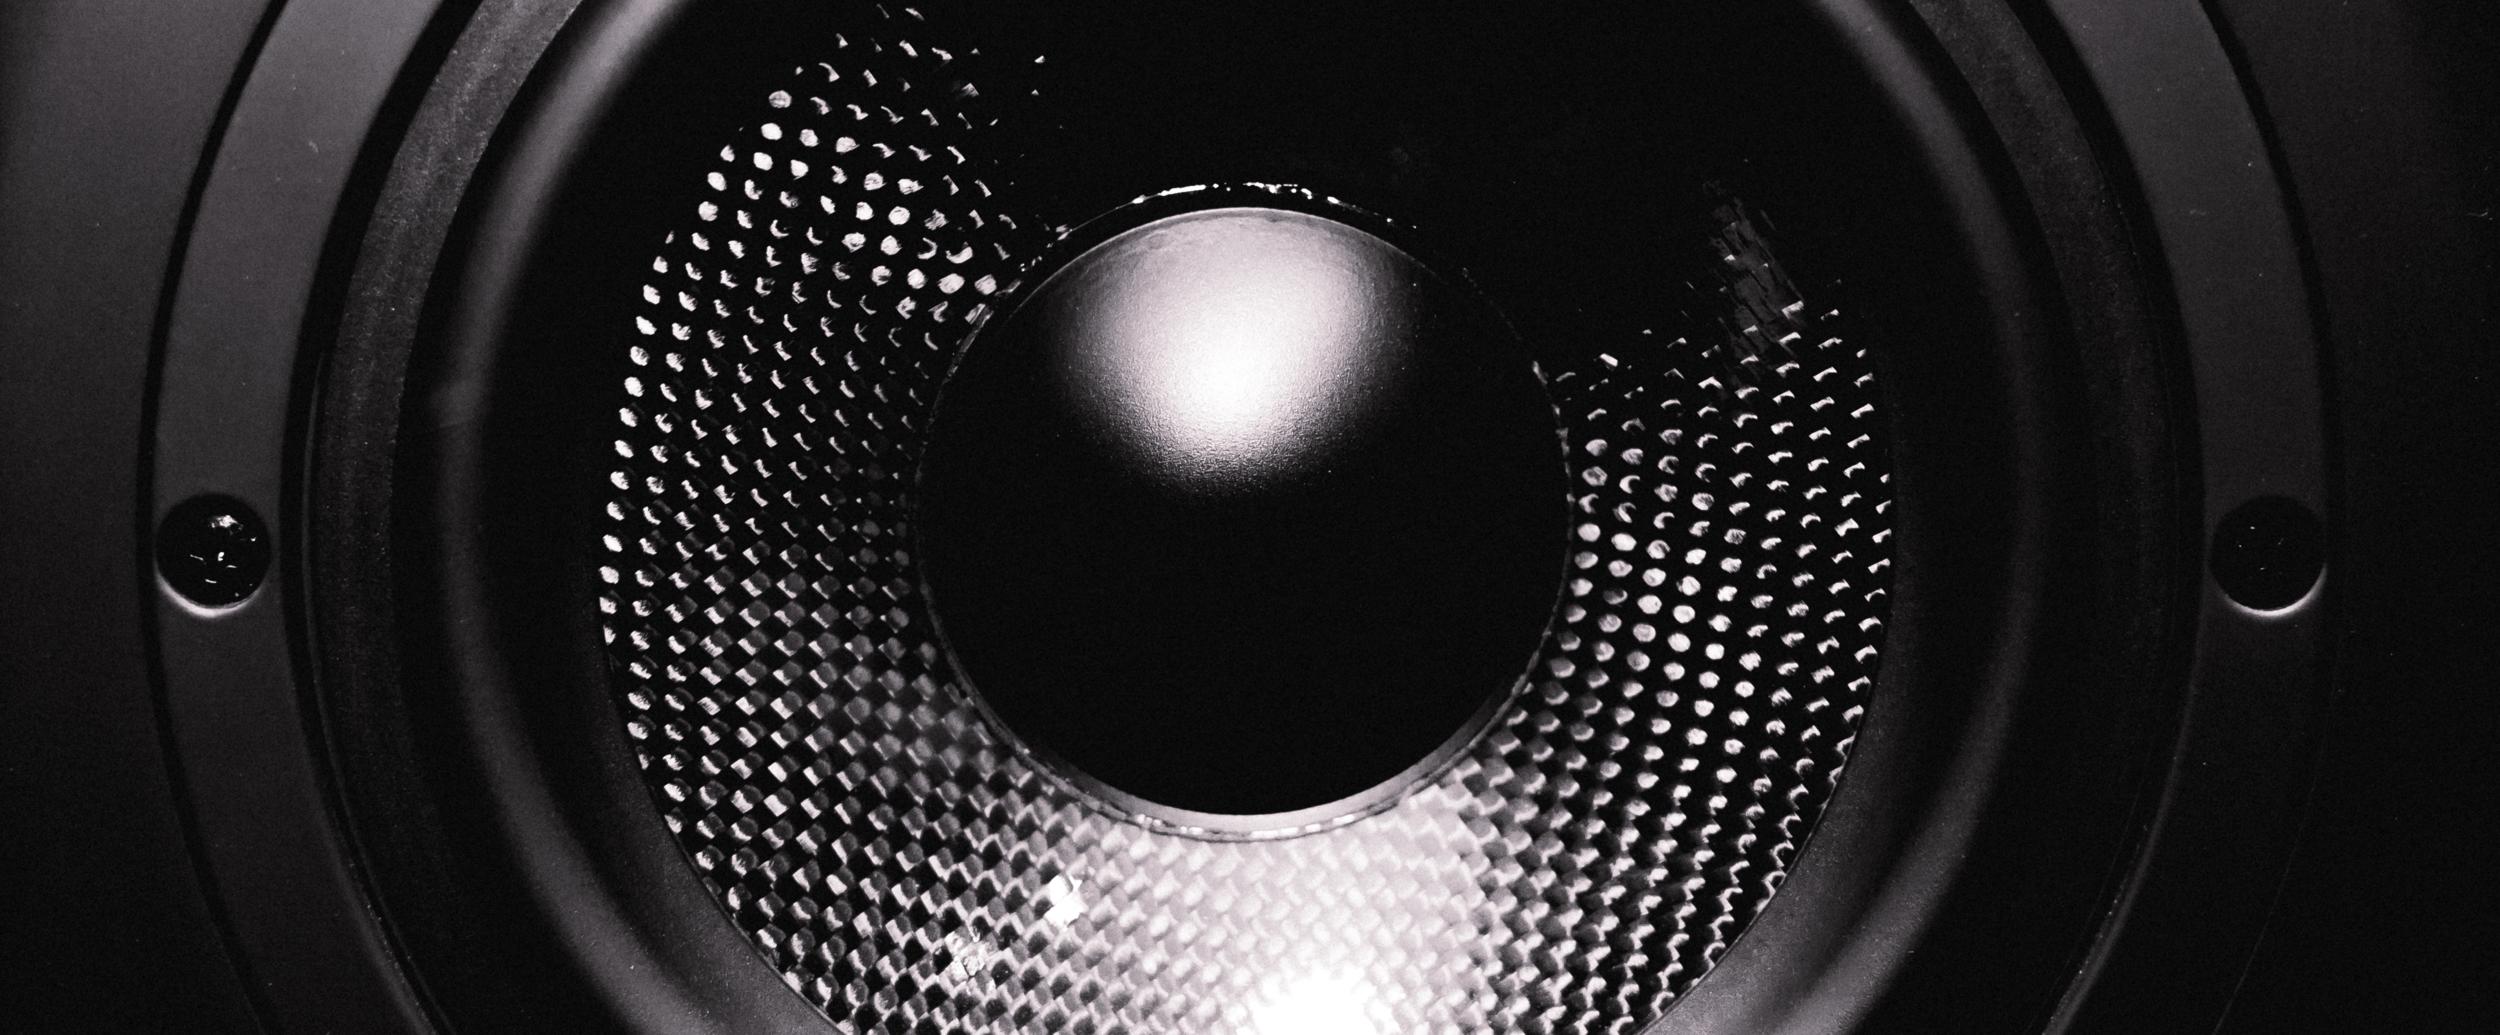 DB2_9703-2 speaker.png